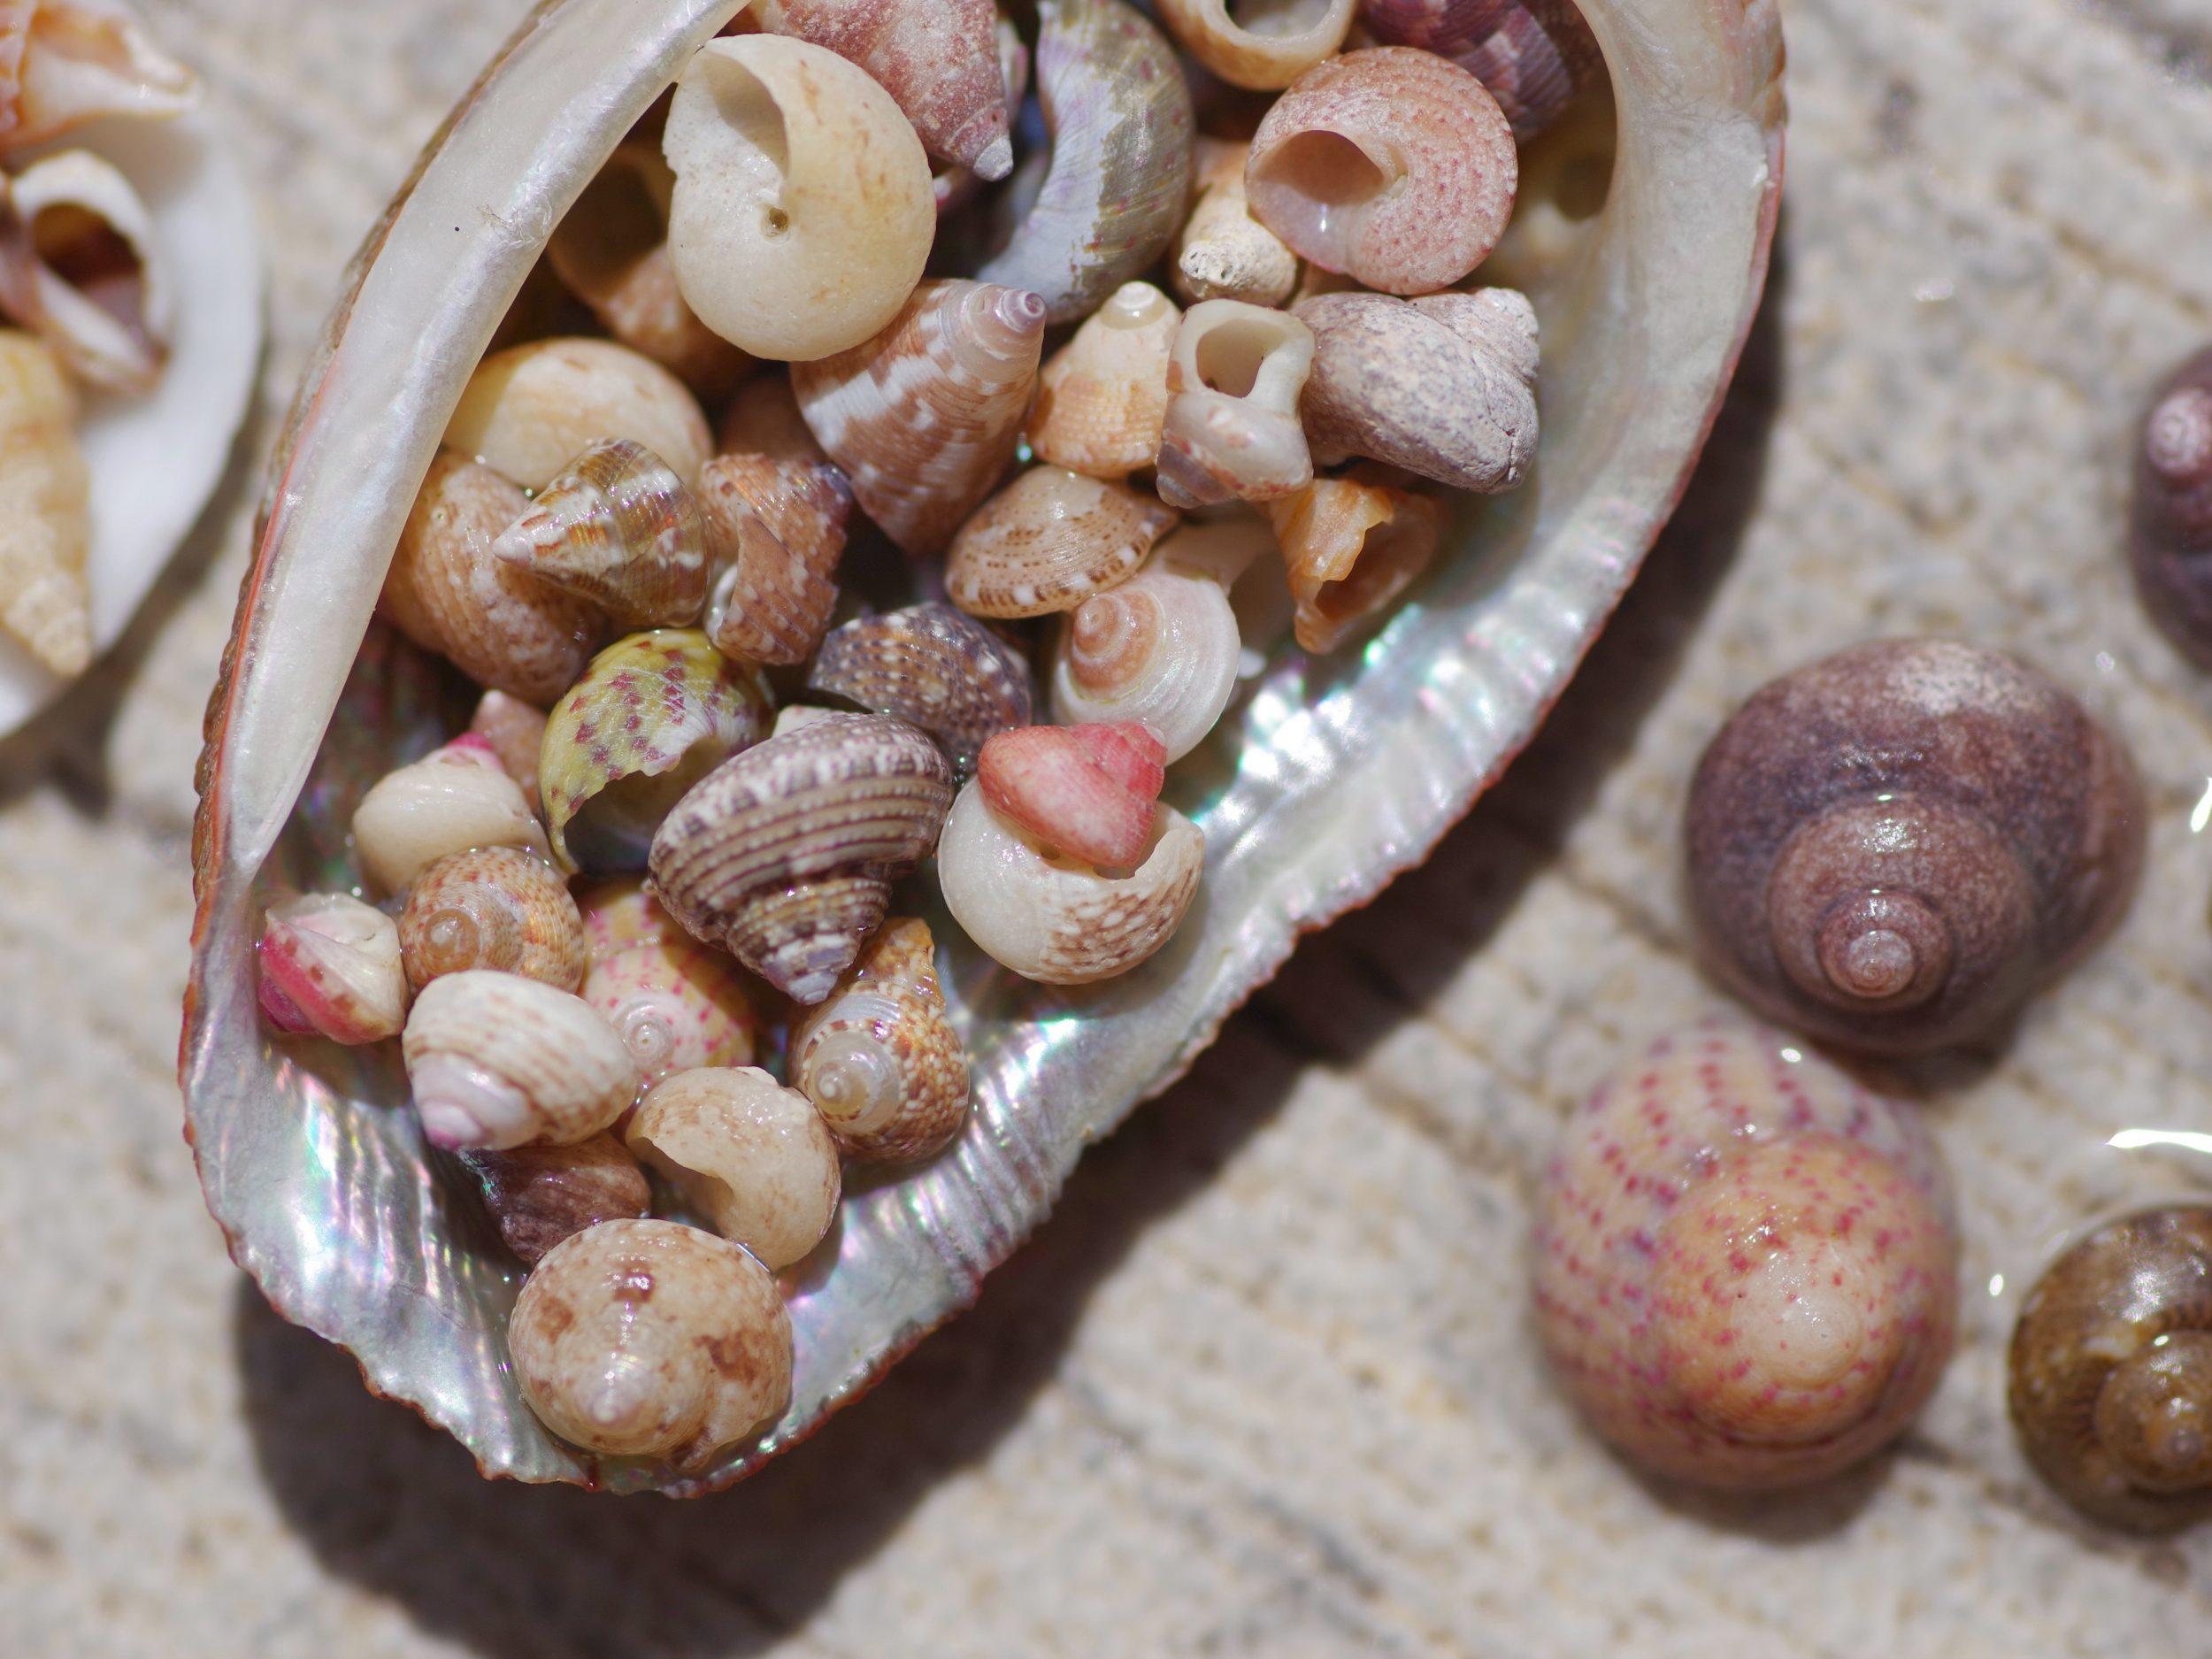 petits coquillages, macrocoquillages dans un ormeau